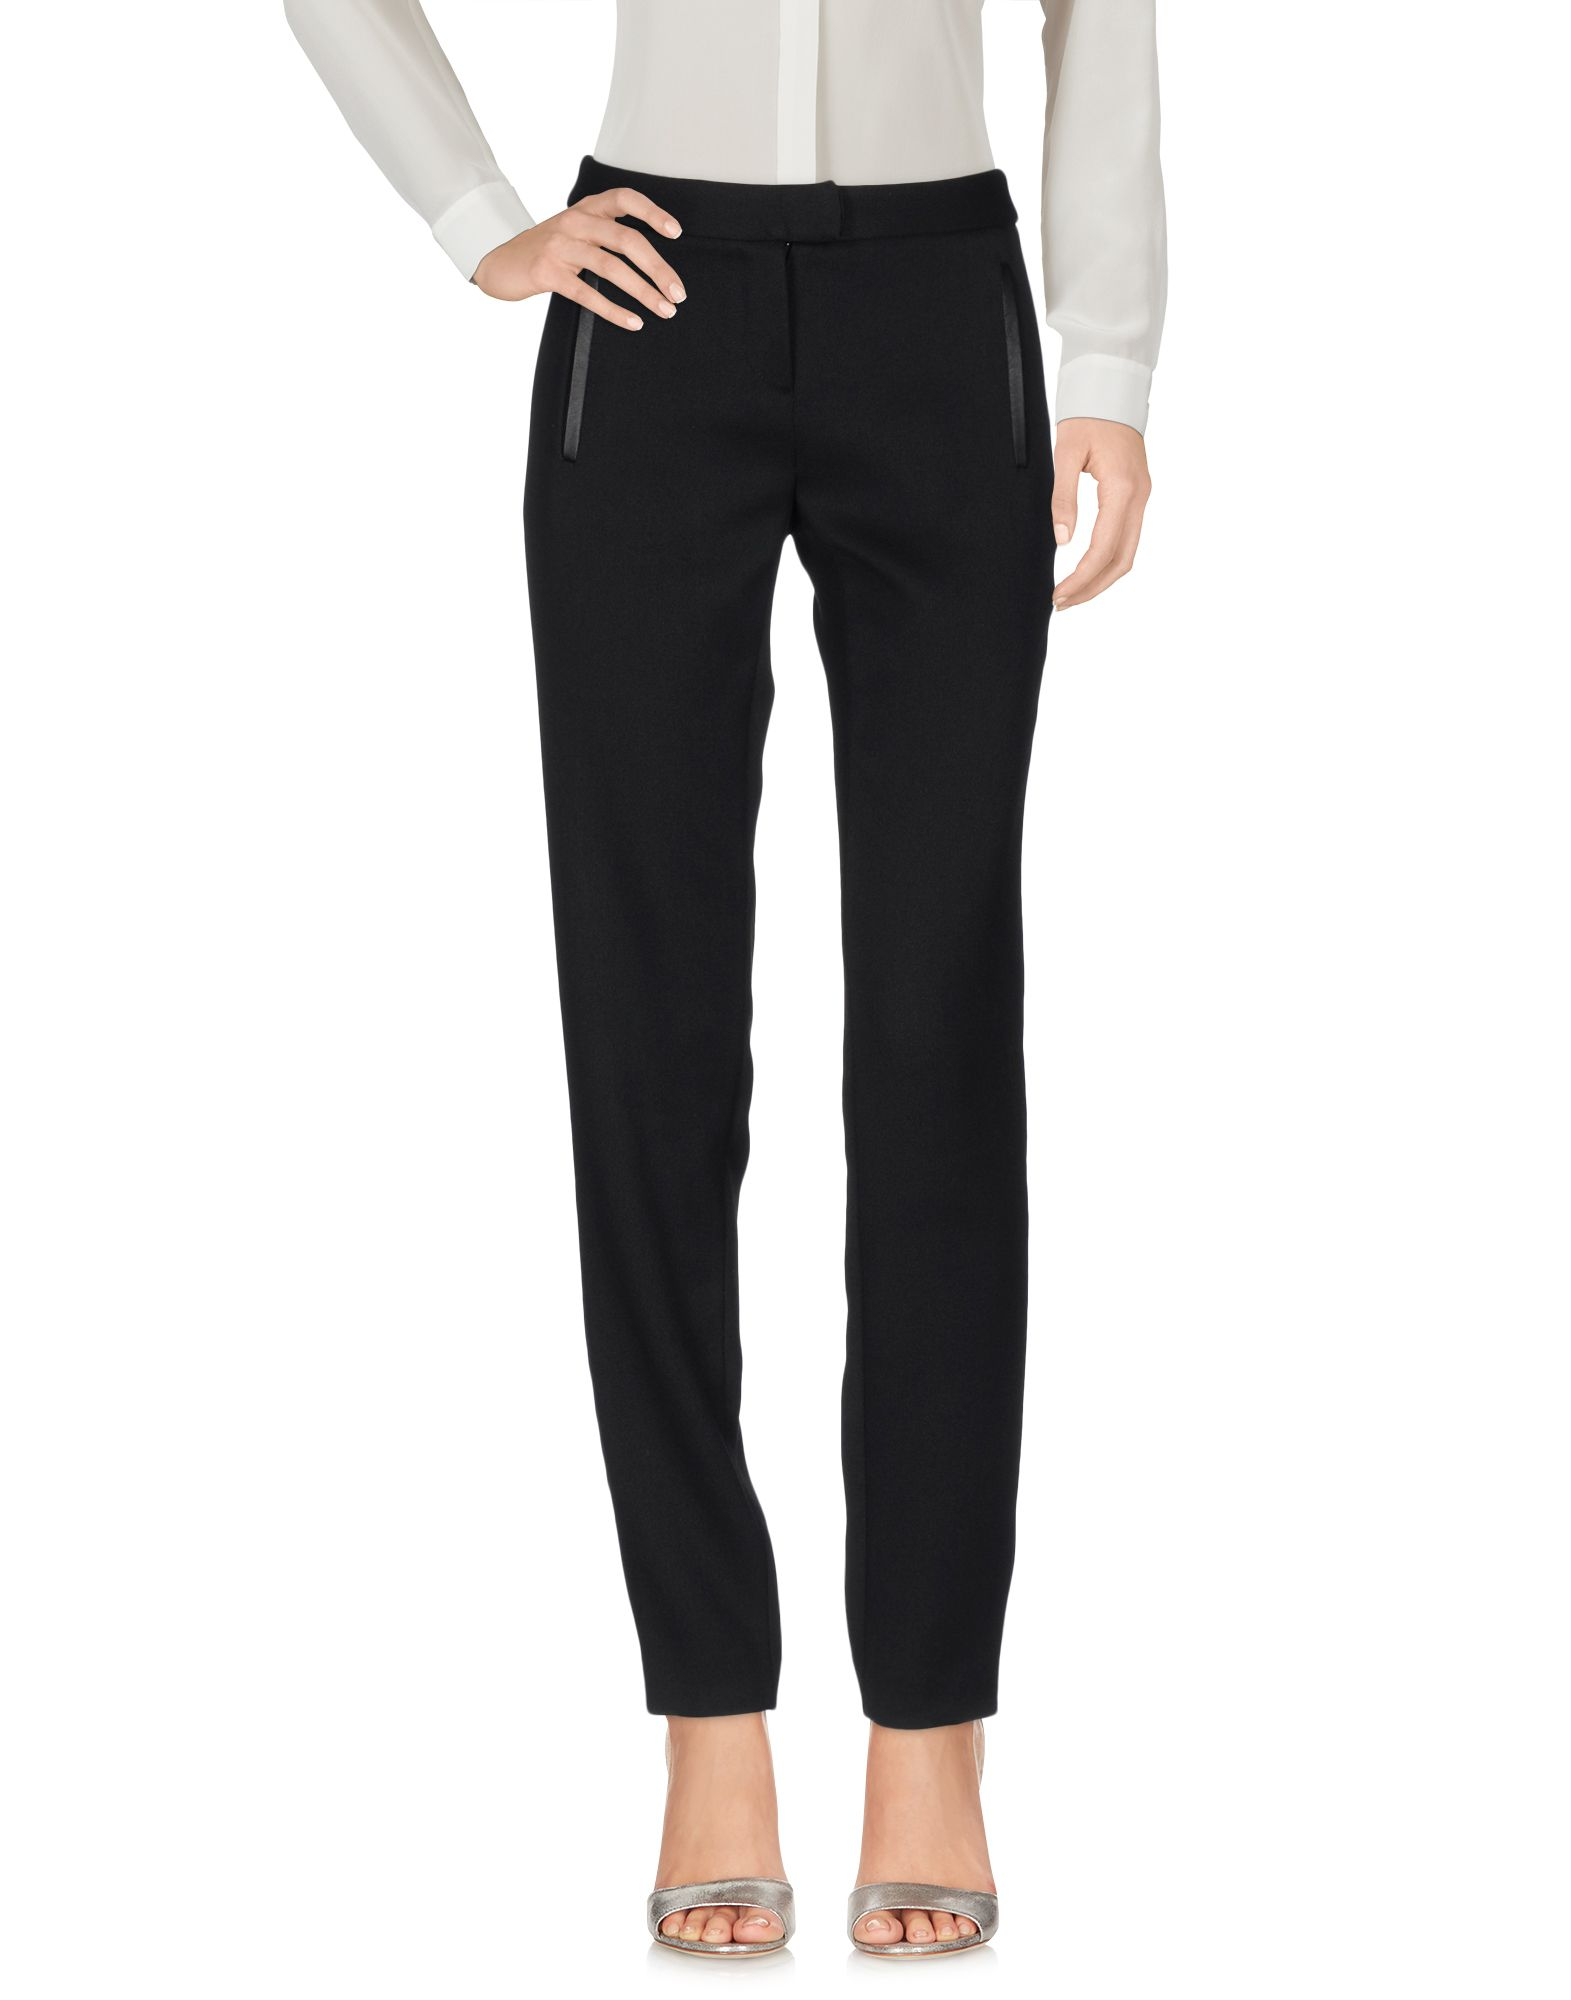 Pantalon maje femme. noir. 34 - 36 - 38 - 40...